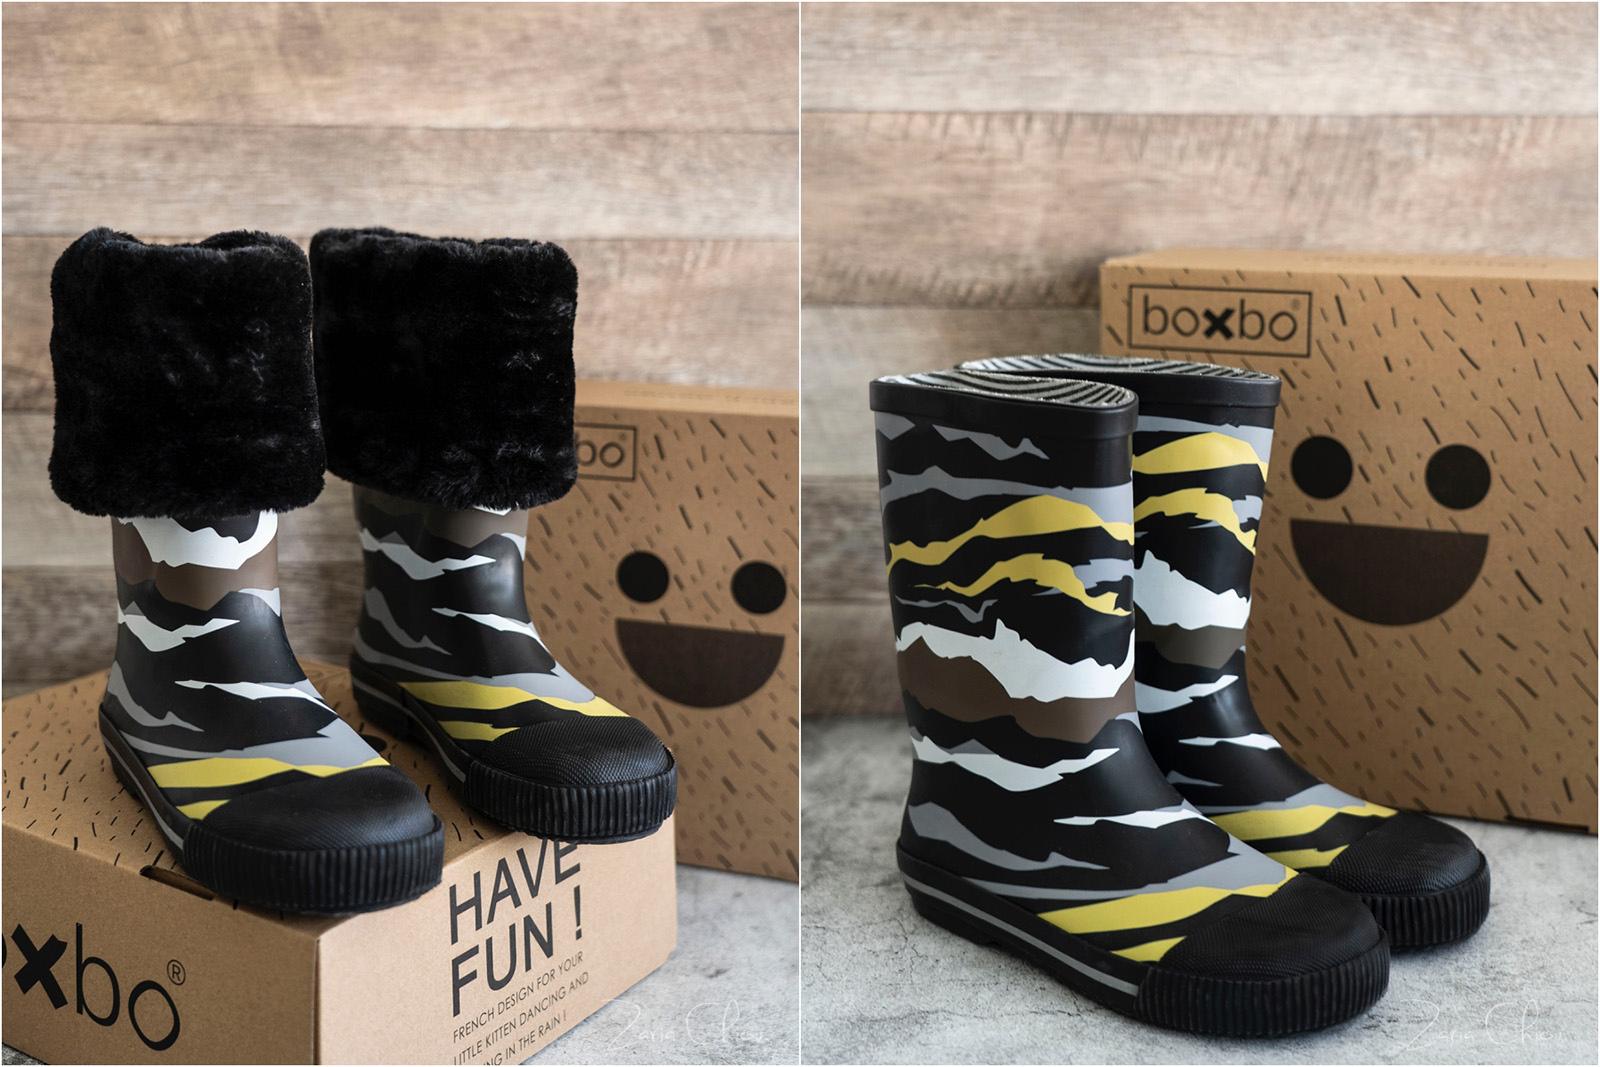 Boxbo 冬天雨靴 迷彩黑